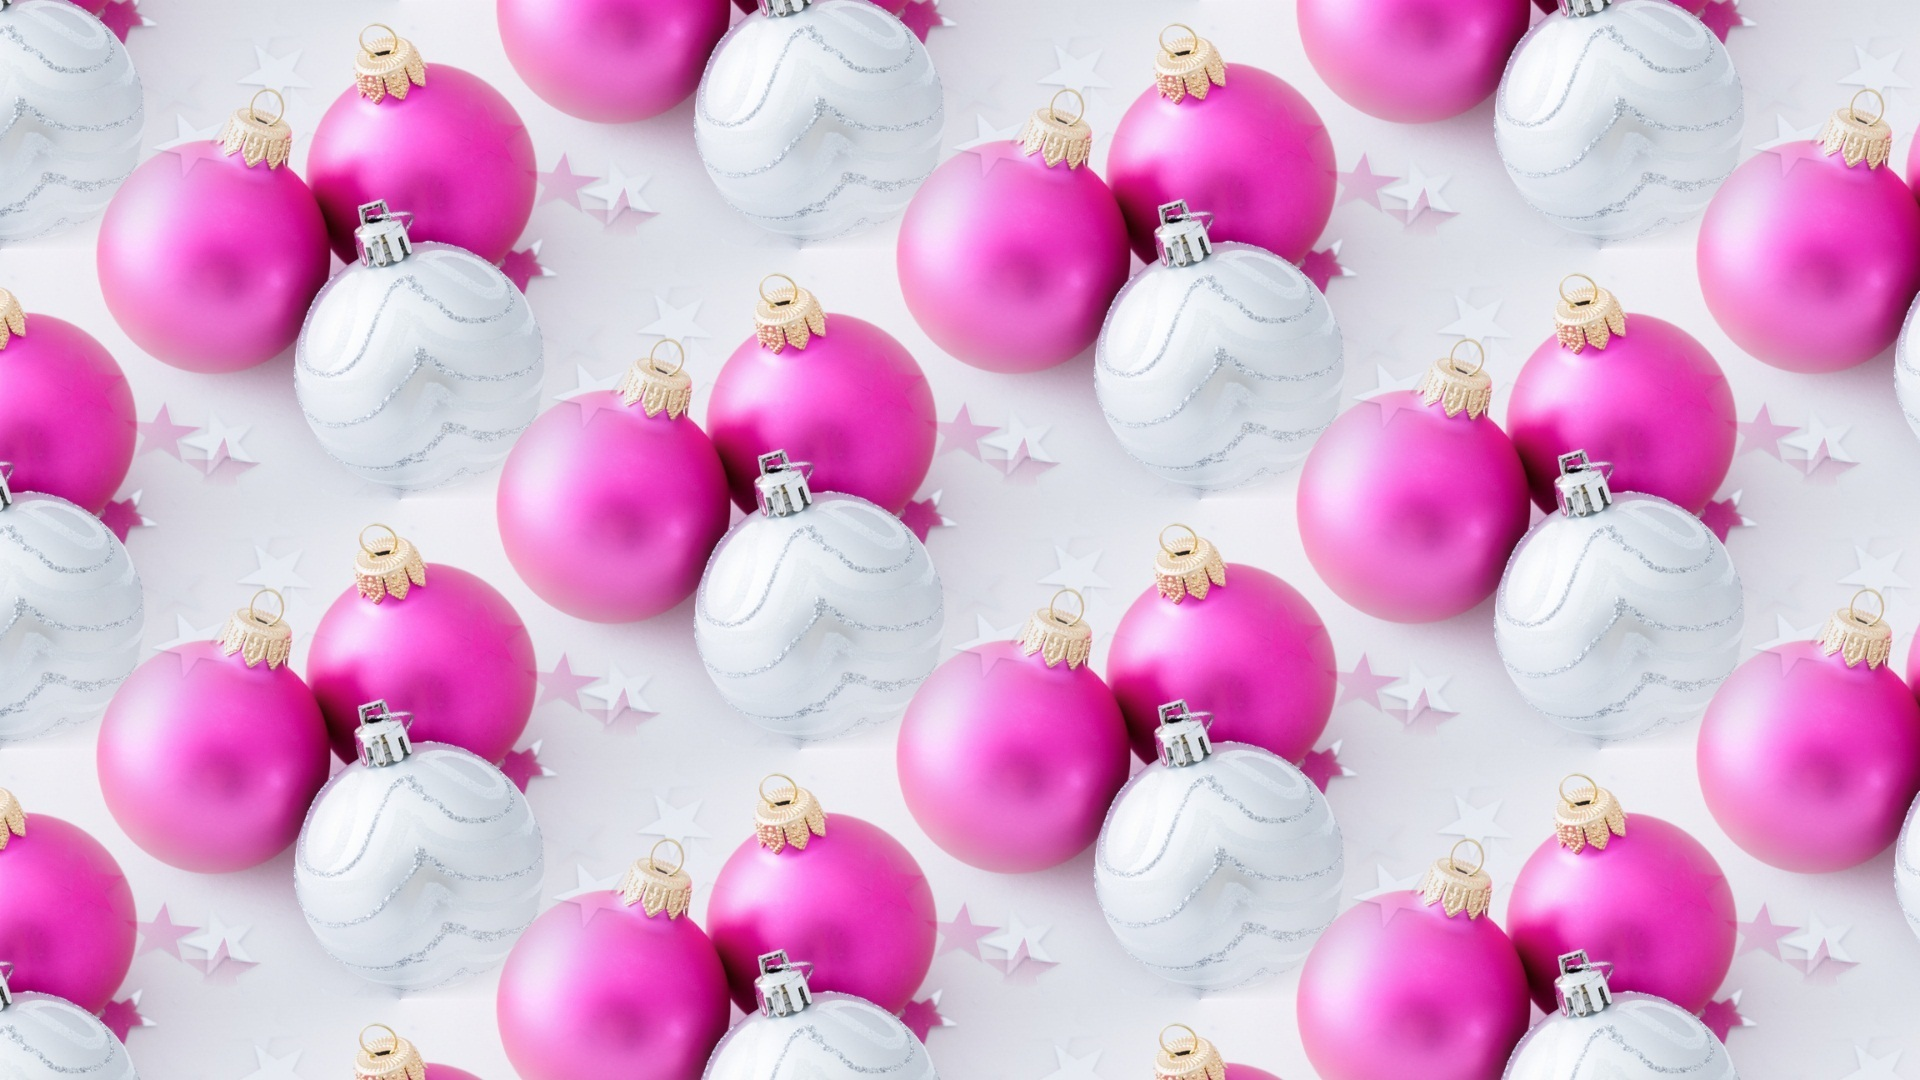 Pink and white Christmas